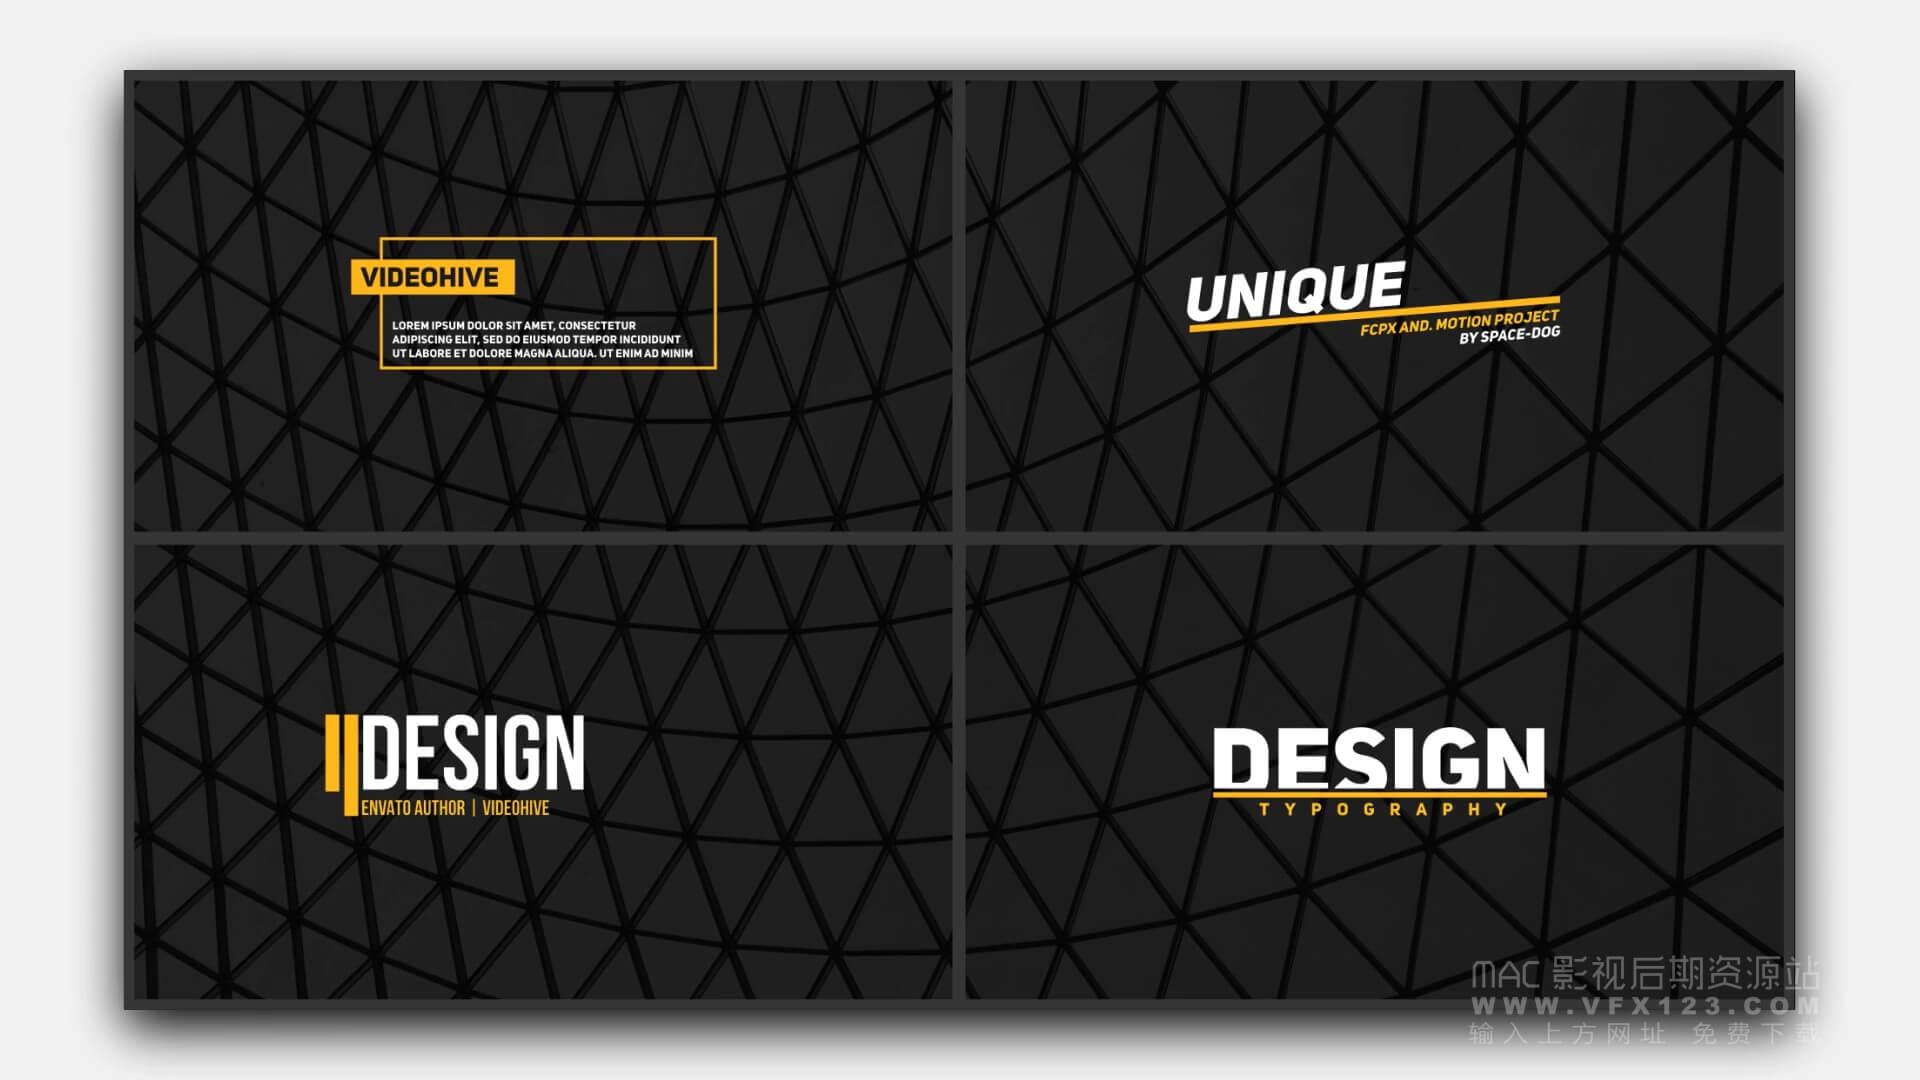 fcpx标题插件 50个现代简洁公司商务类标题模板 50 titles pack